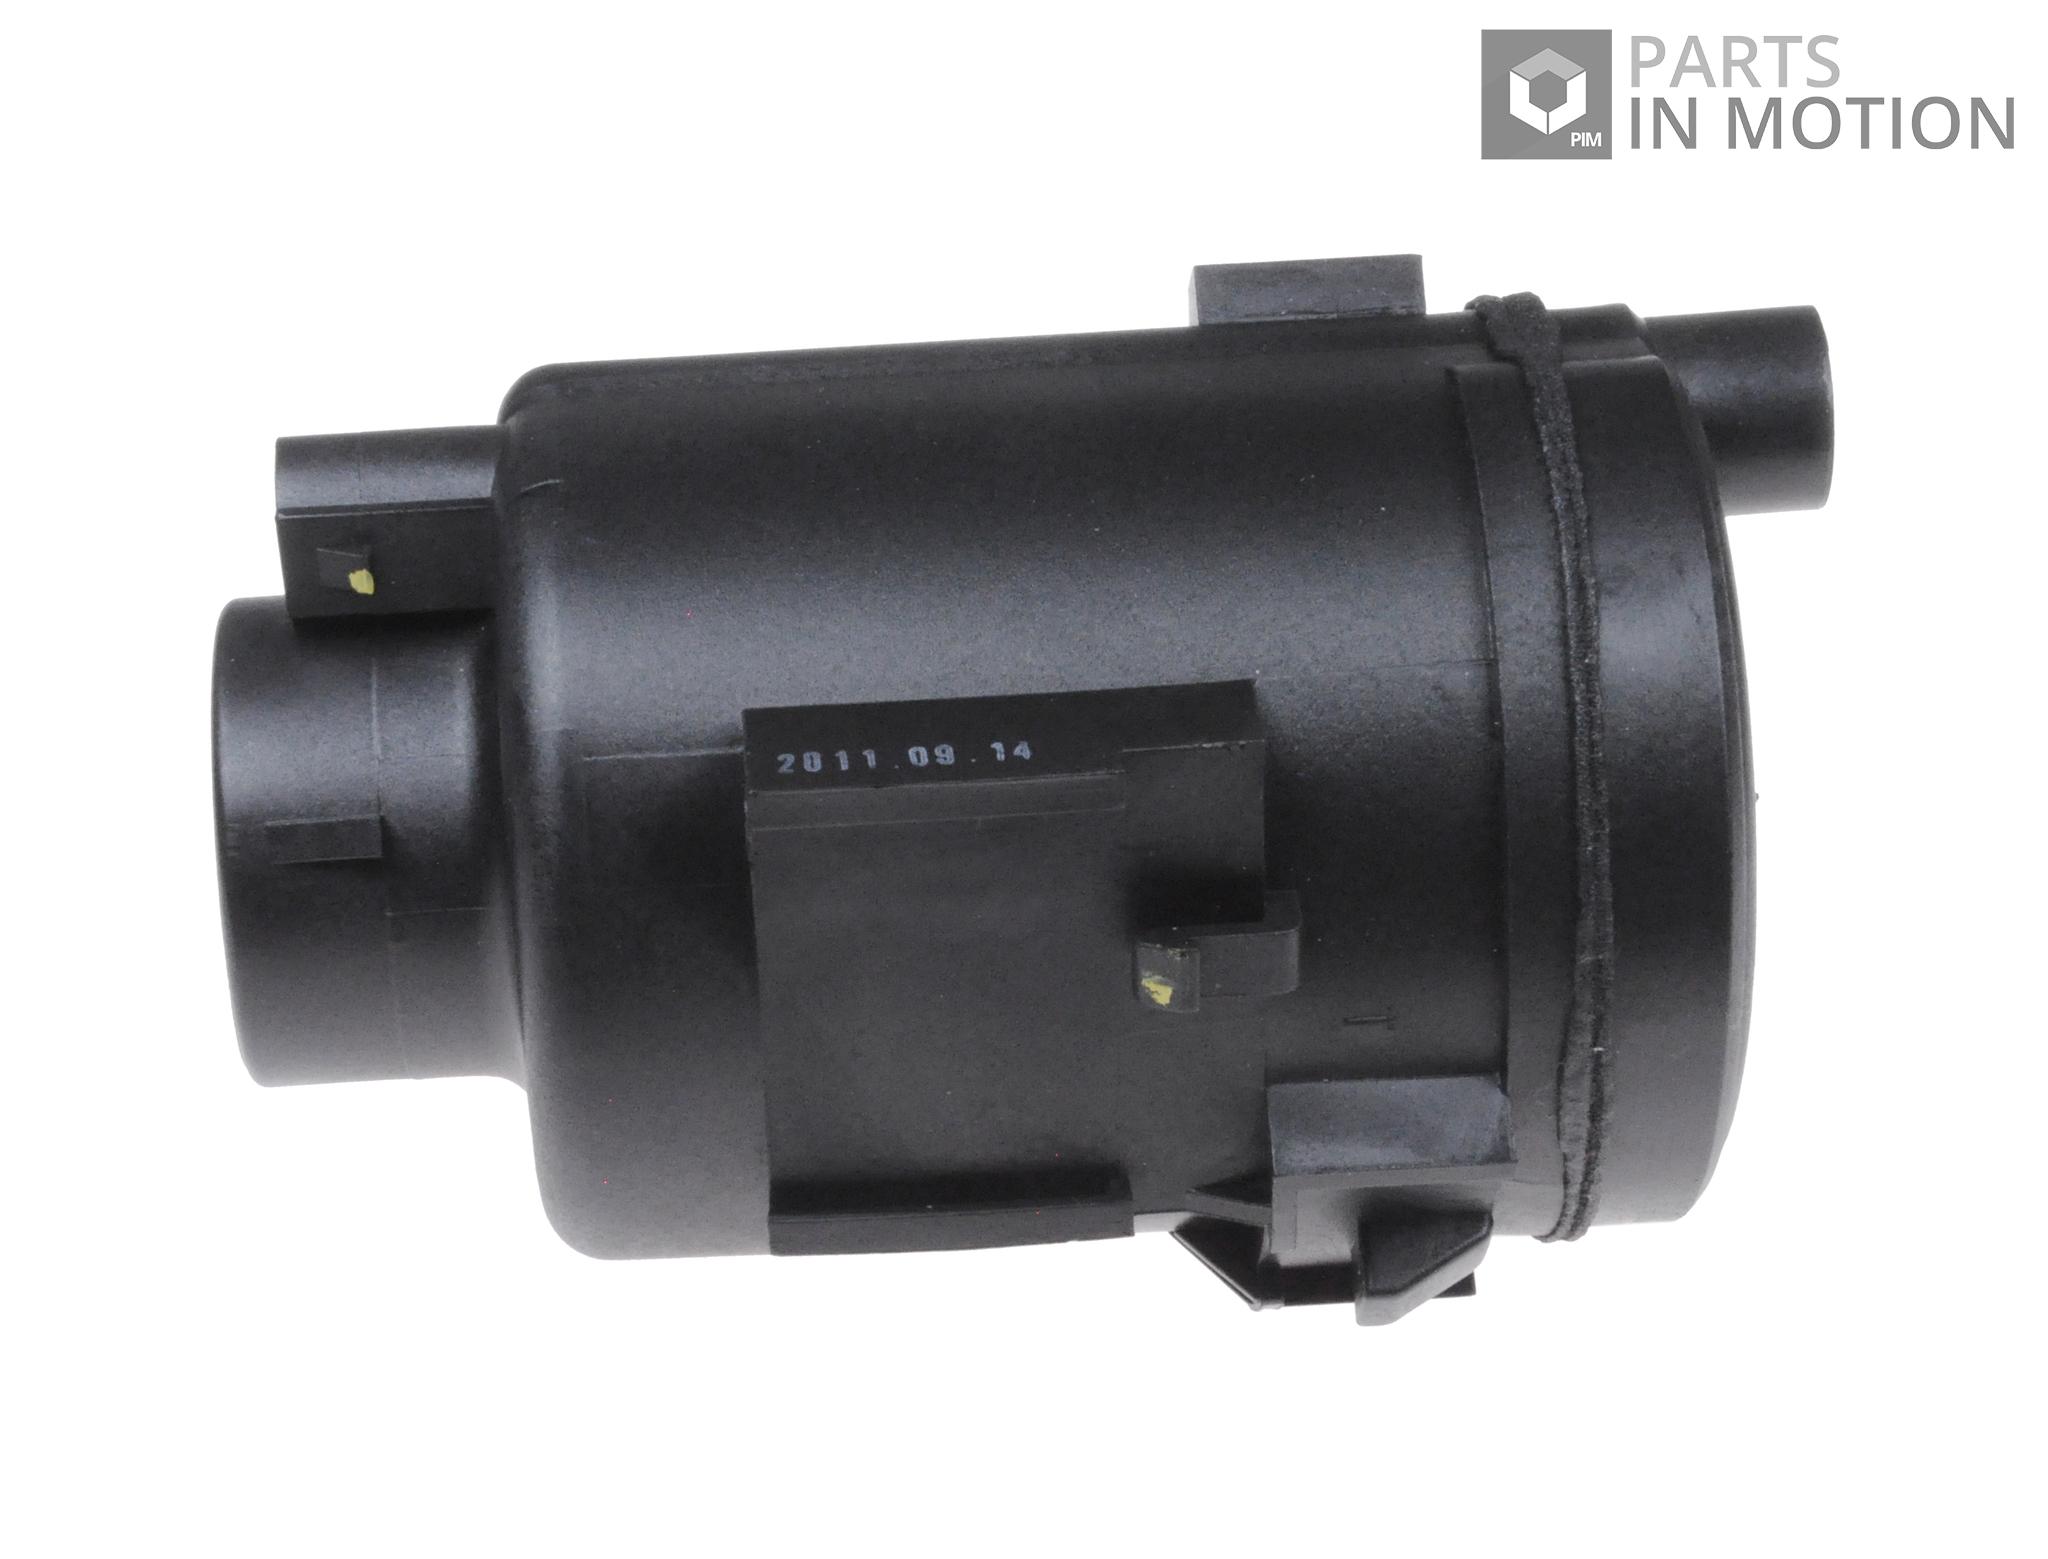 Fuel Filter Fits Hyundai Getz 13 In Tank 02 To 09 G4ea Adl 2011 Kia Sorento Location Blue Print Adg02344 2